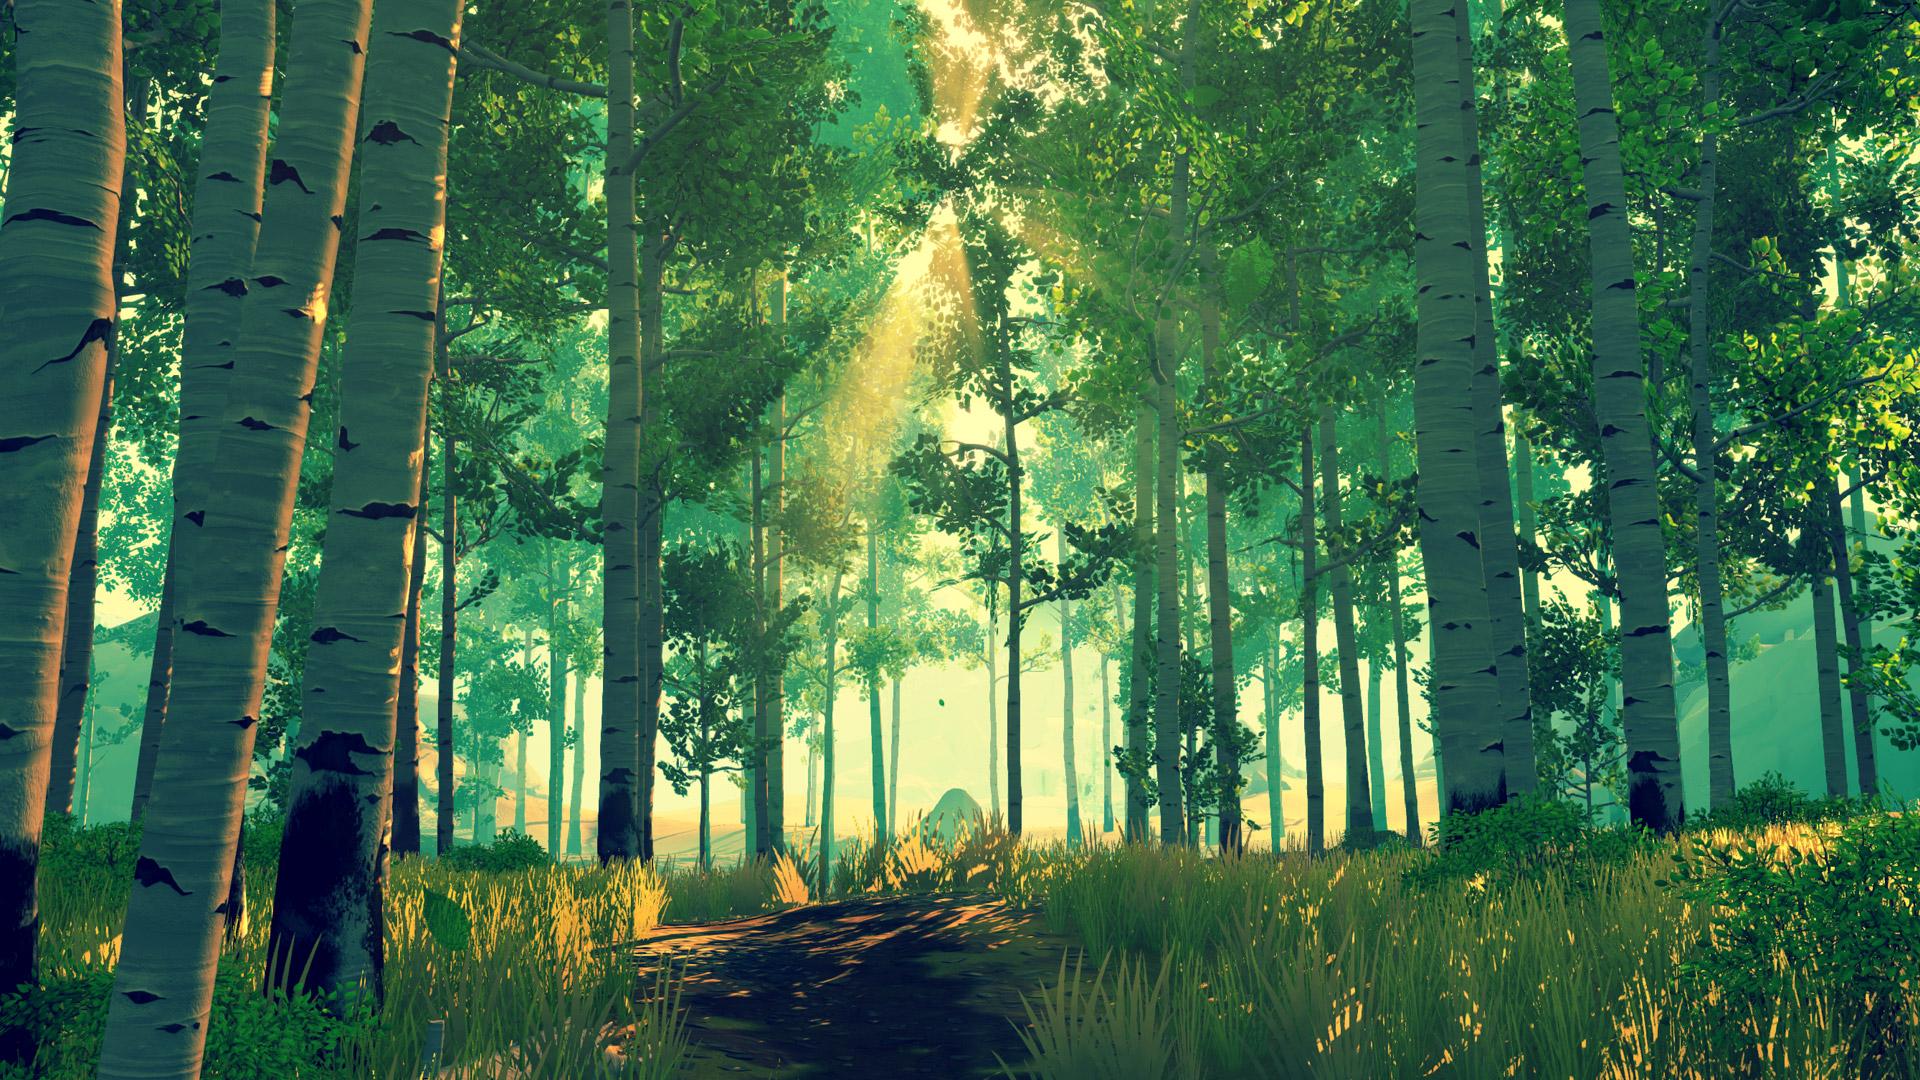 Firewatch - green forest of birch trees